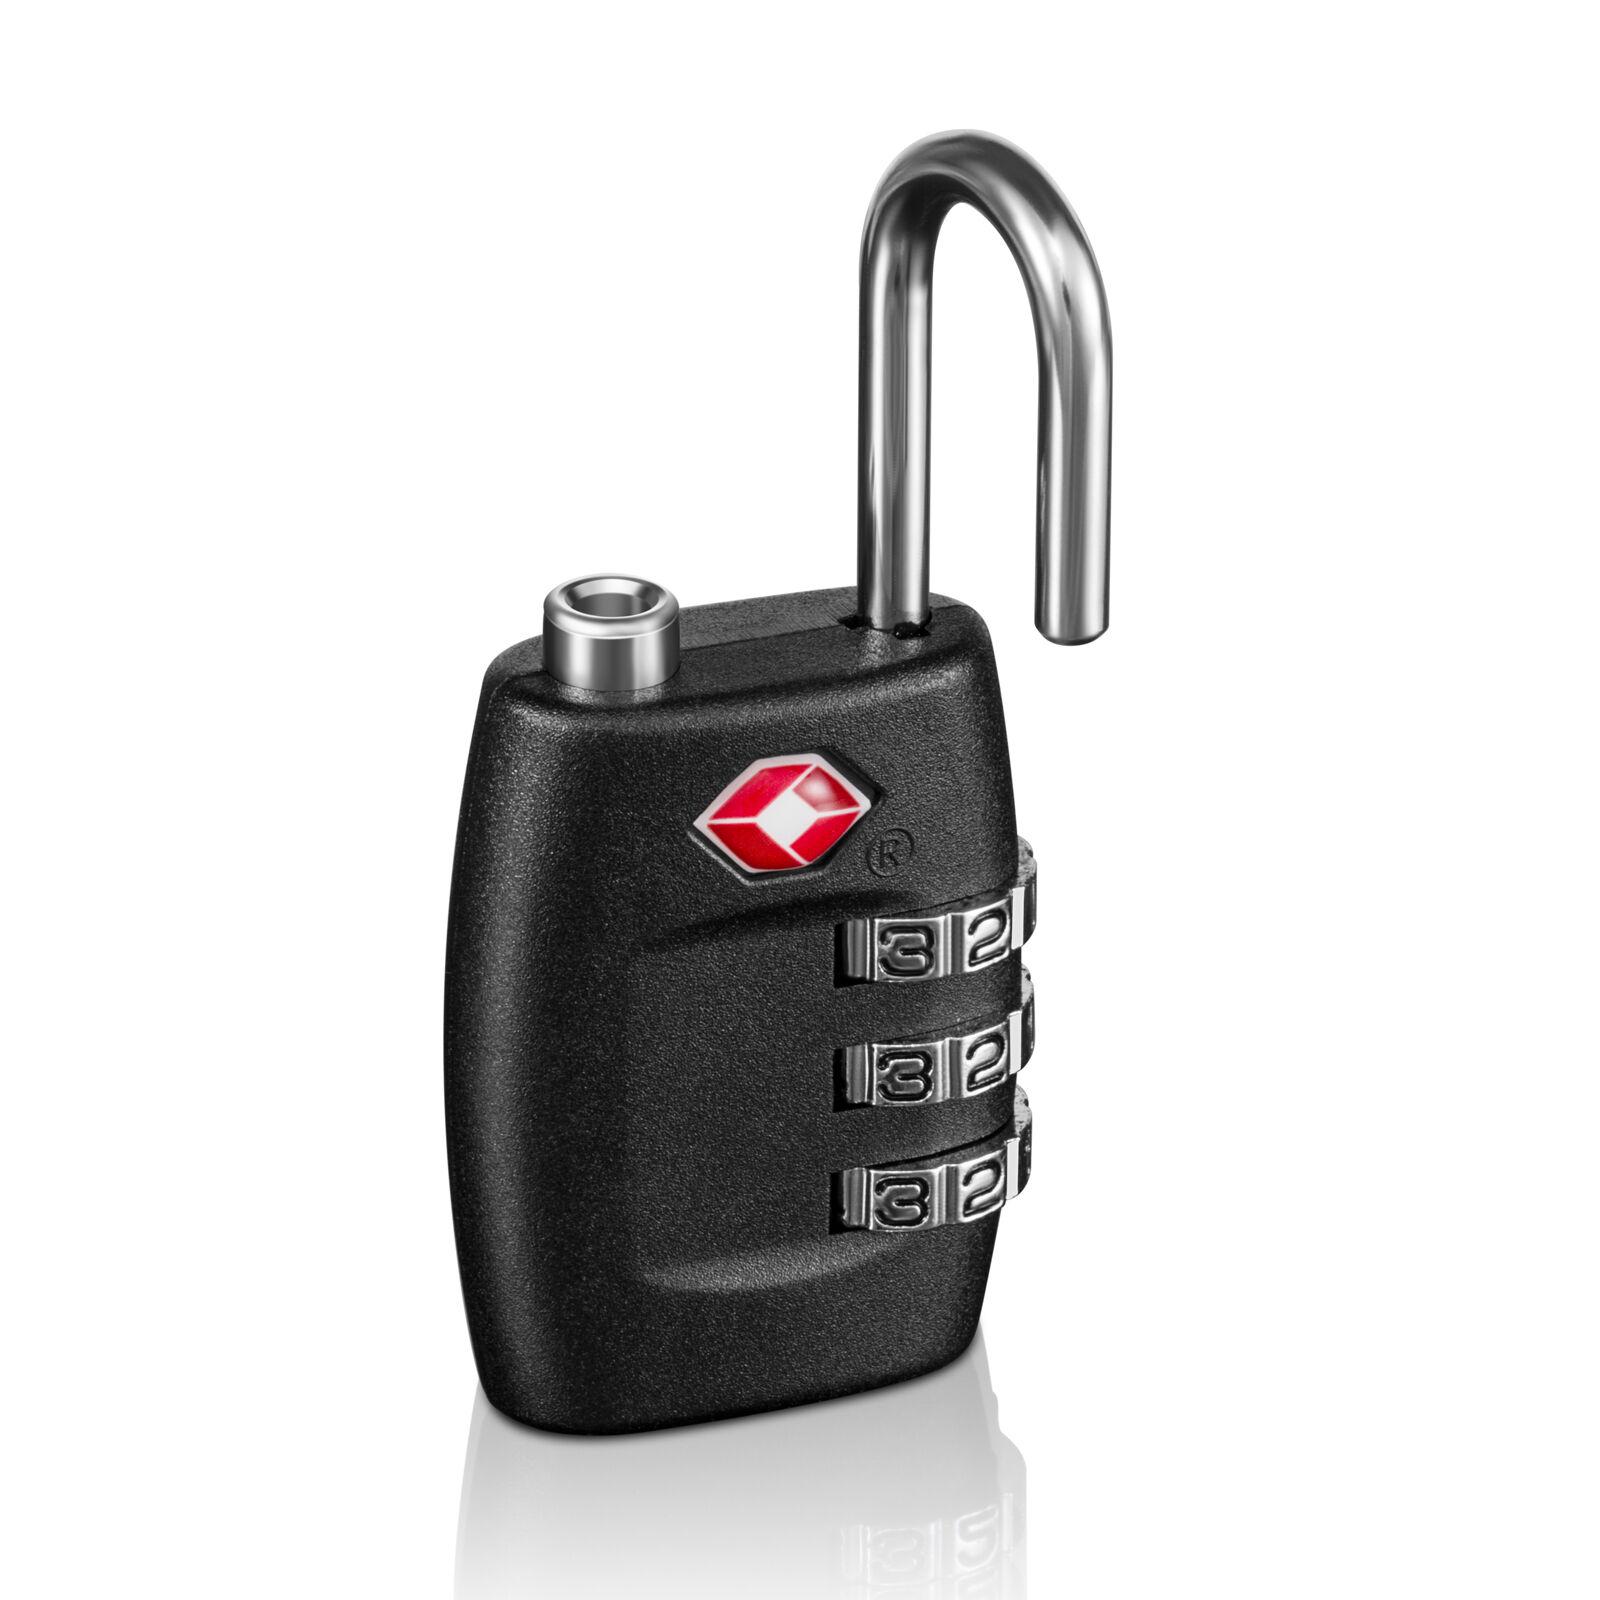 BG 4 x TSA Lock Travel Luggage 3 Digit Combination Resettable NEW TL01 (4 pcs)